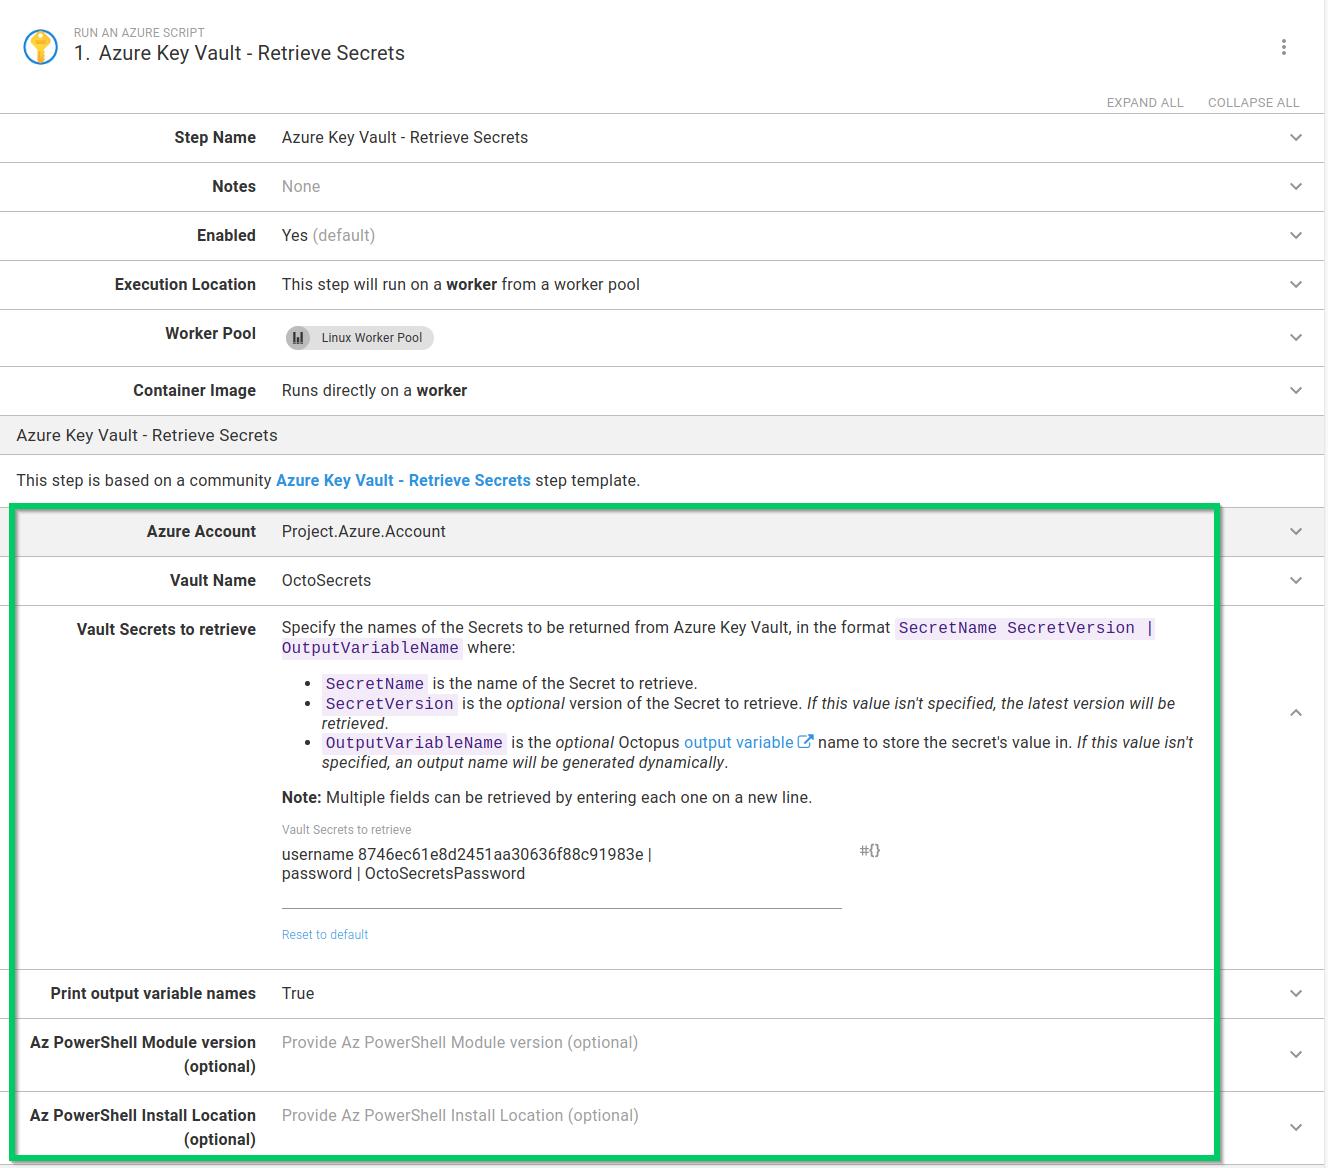 Azure Key Vault retrieve secrets step used in a process